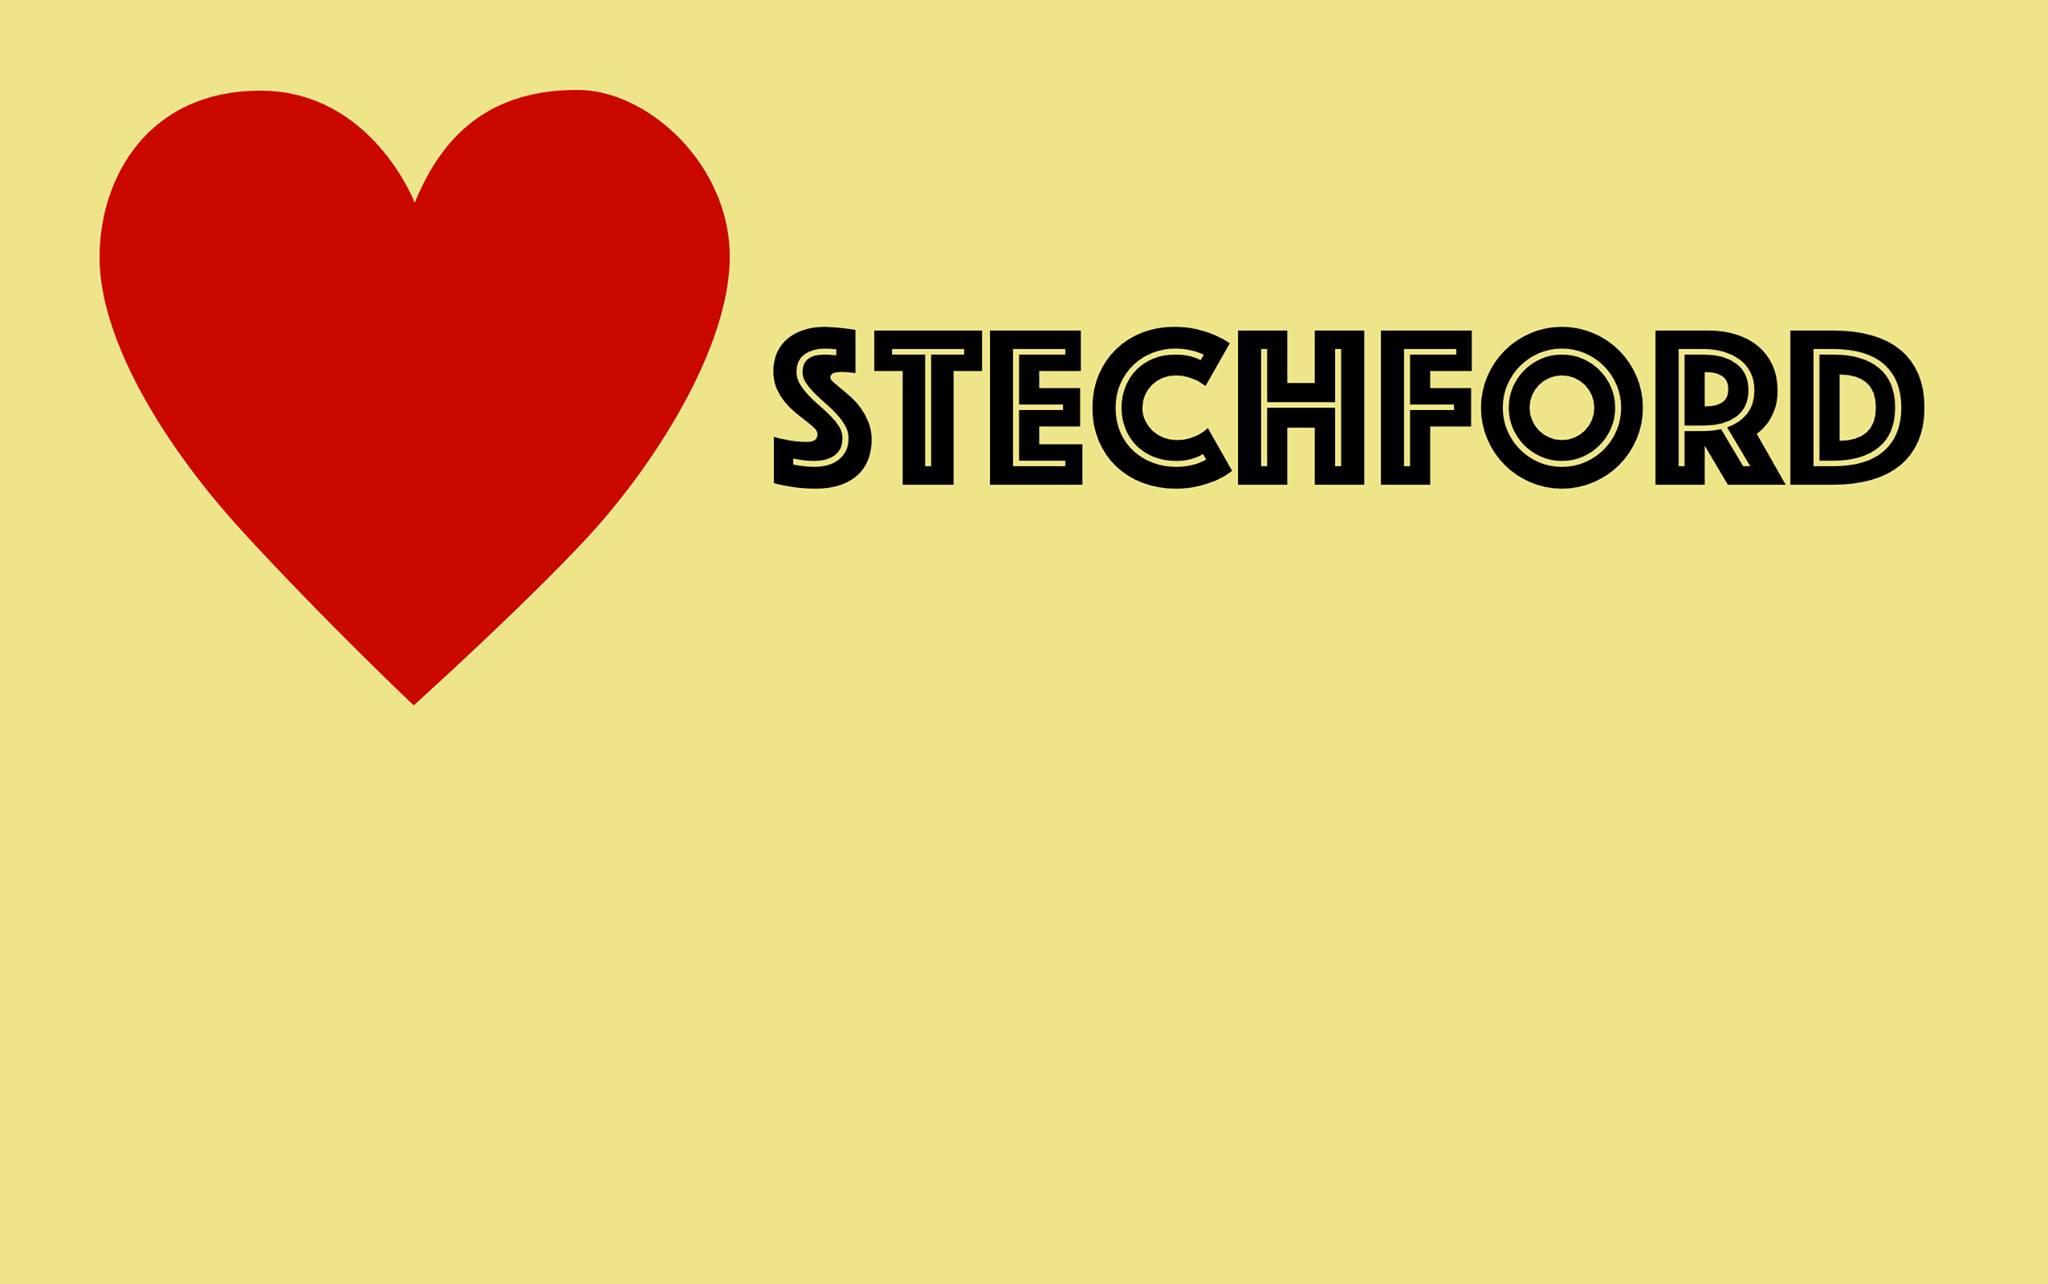 Love Stechford